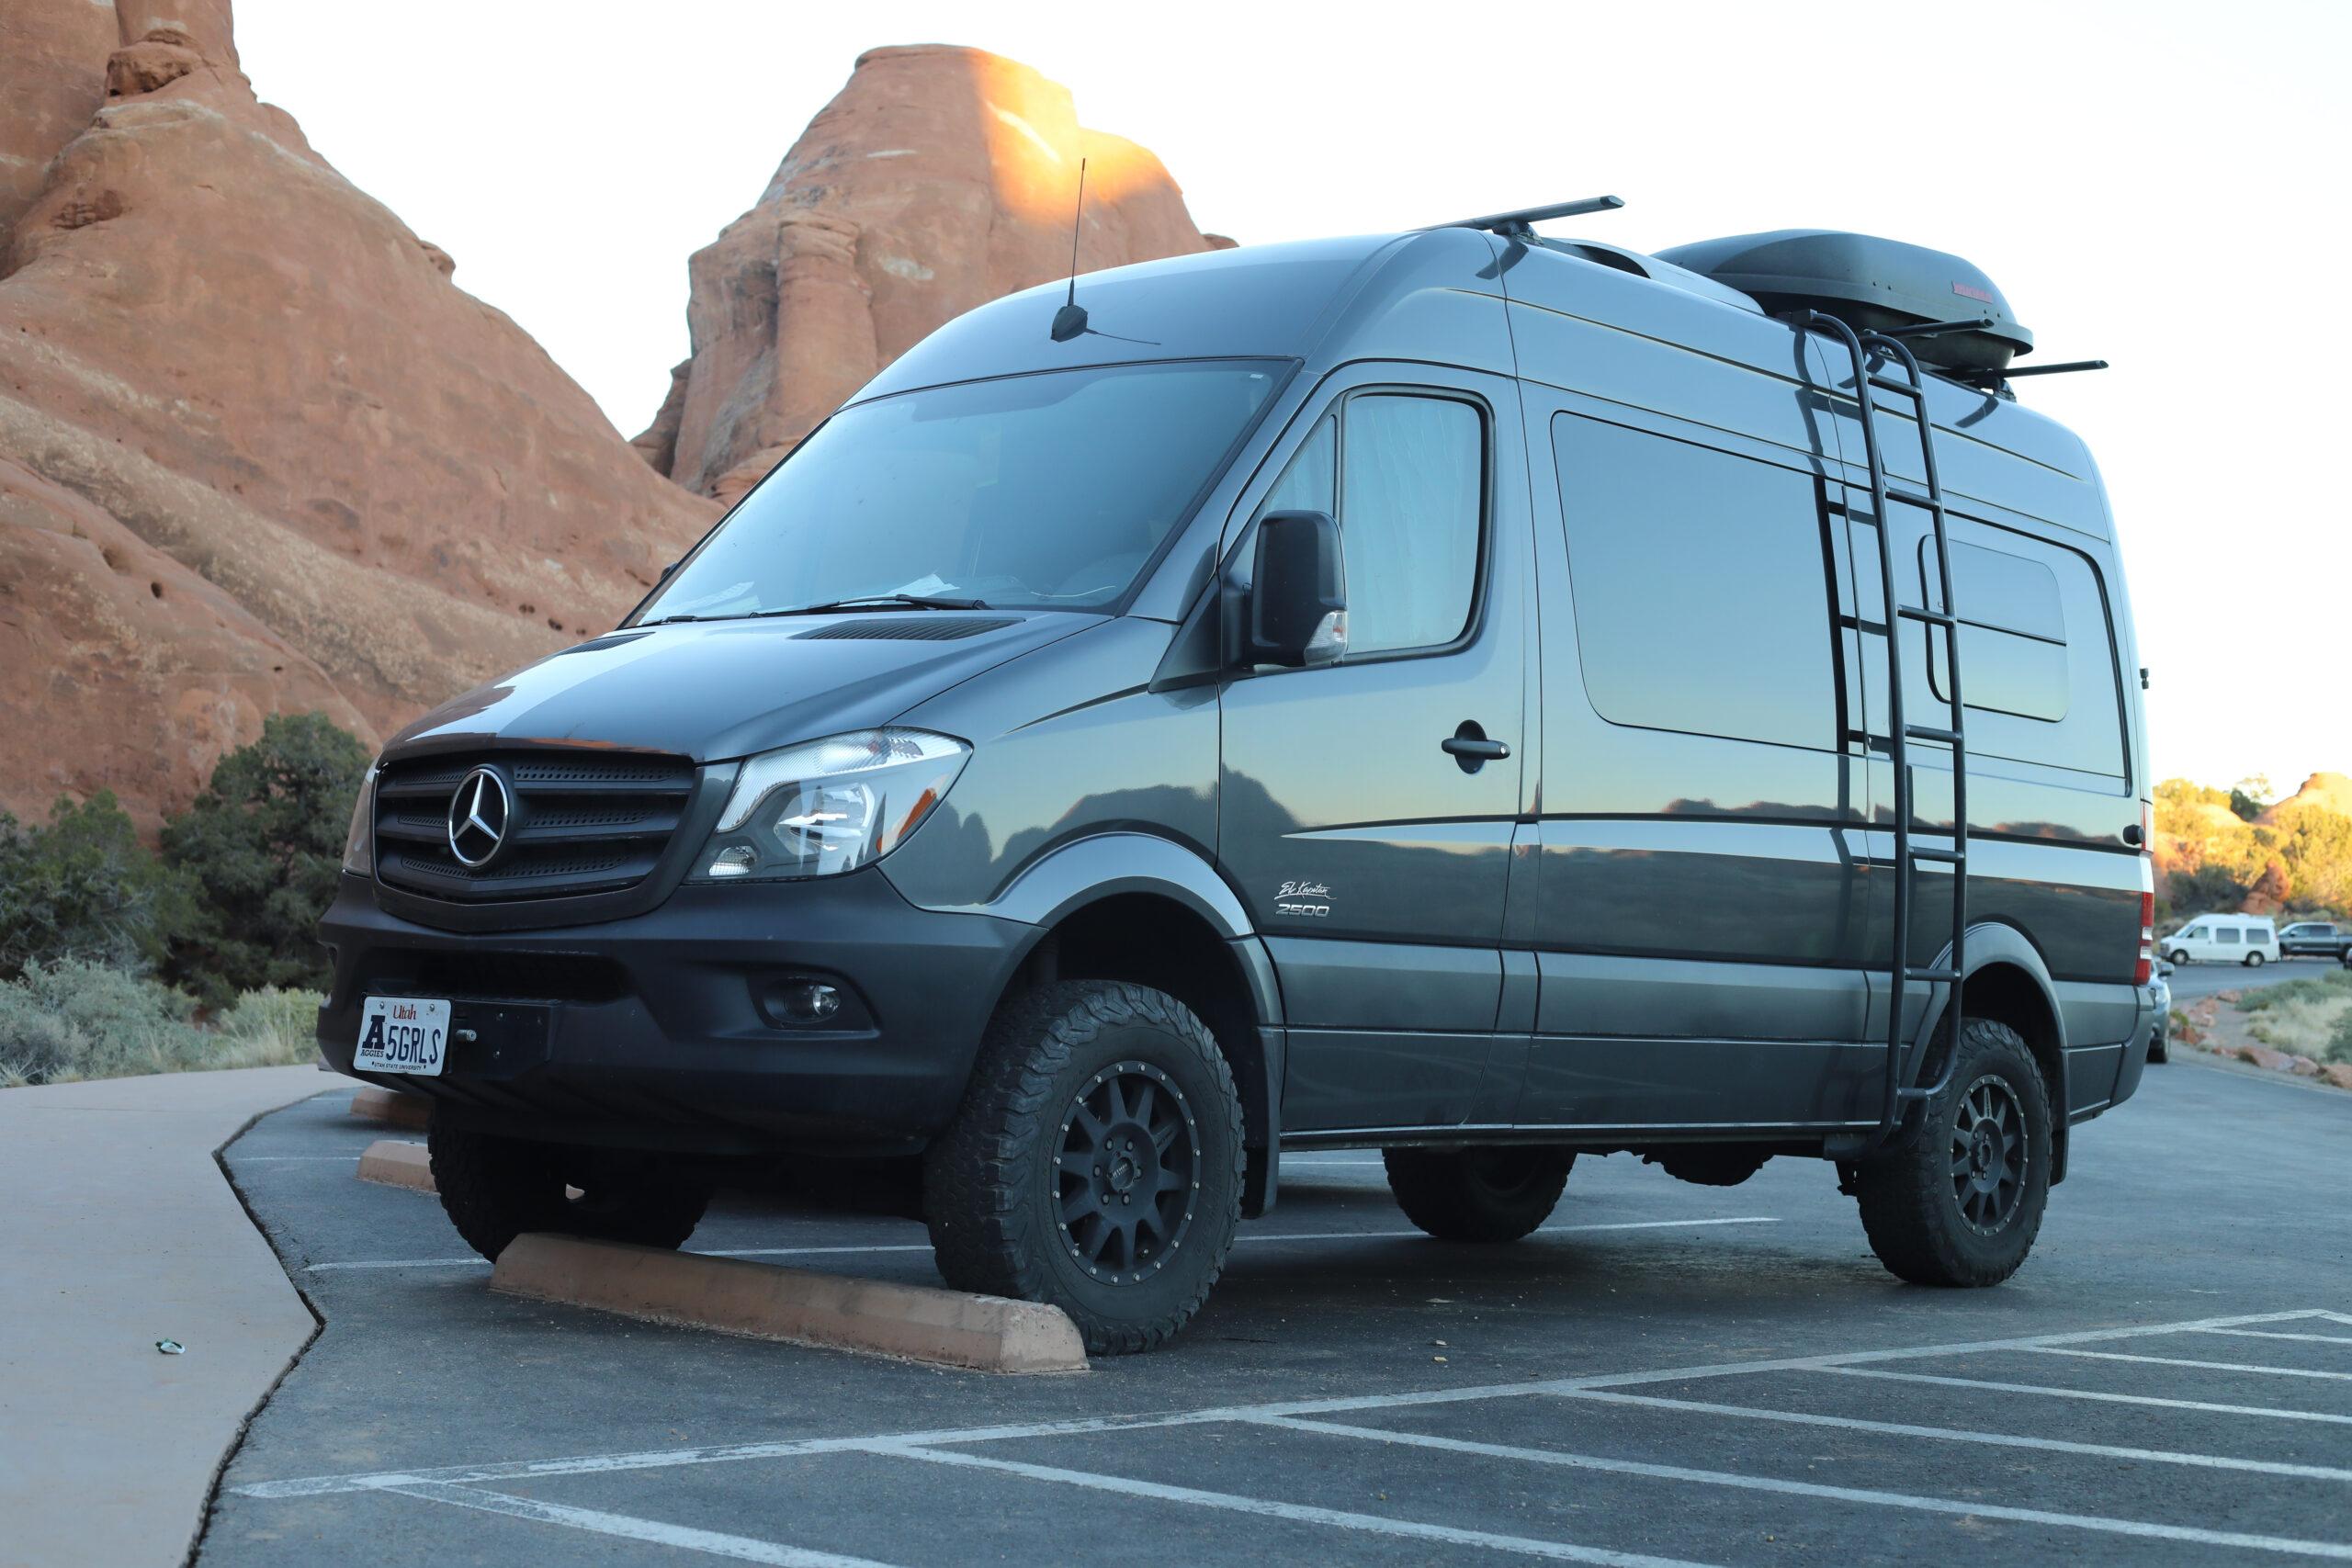 Sprinter van conversions - exterior view of van in Utah